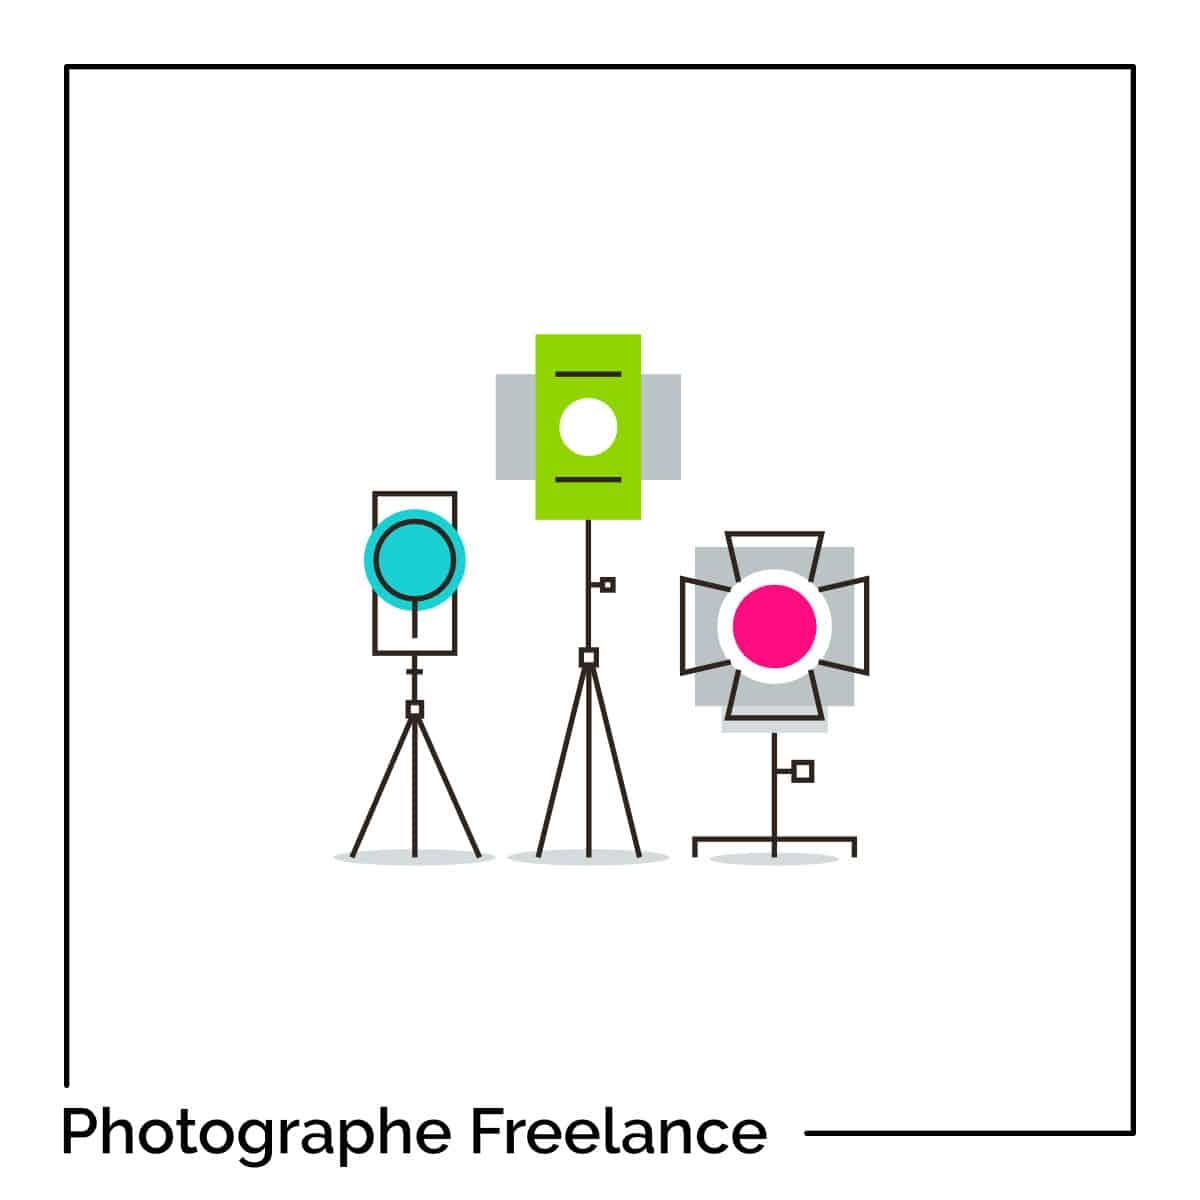 Photographe Freelance Compétences